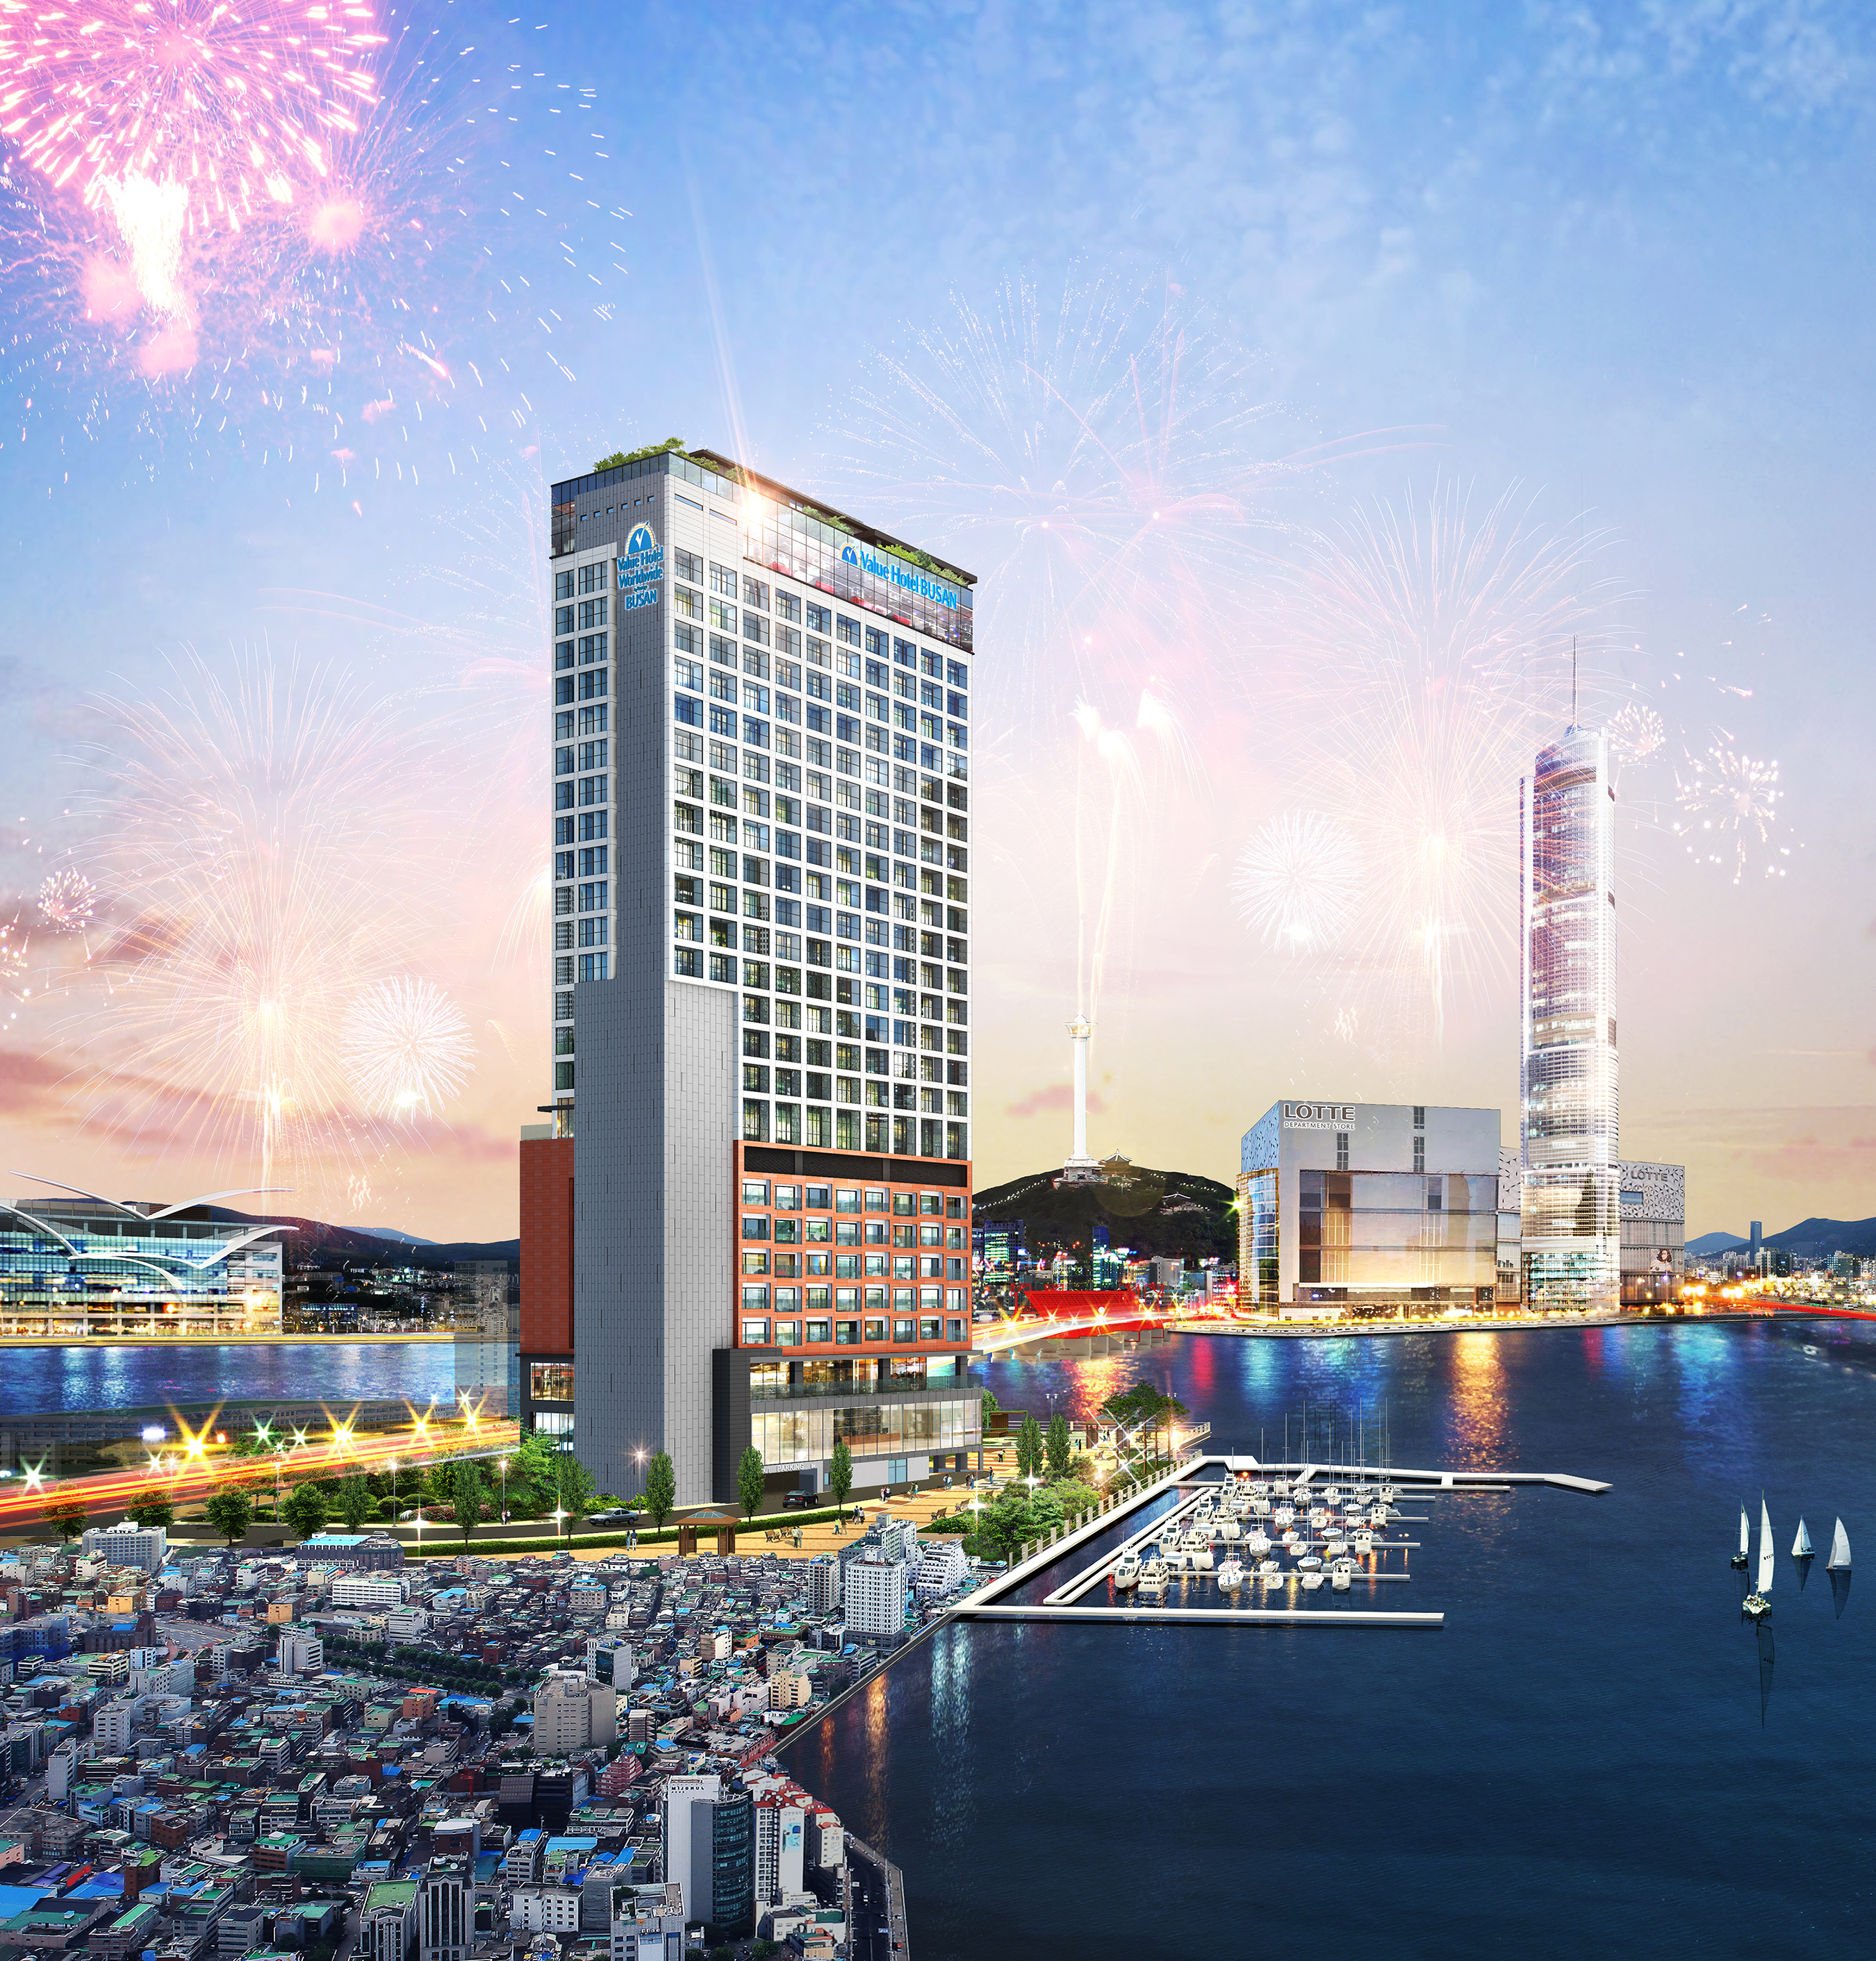 vantage hotels adds 340 room lexington hotel in busan south korea rh hospitalitynet org